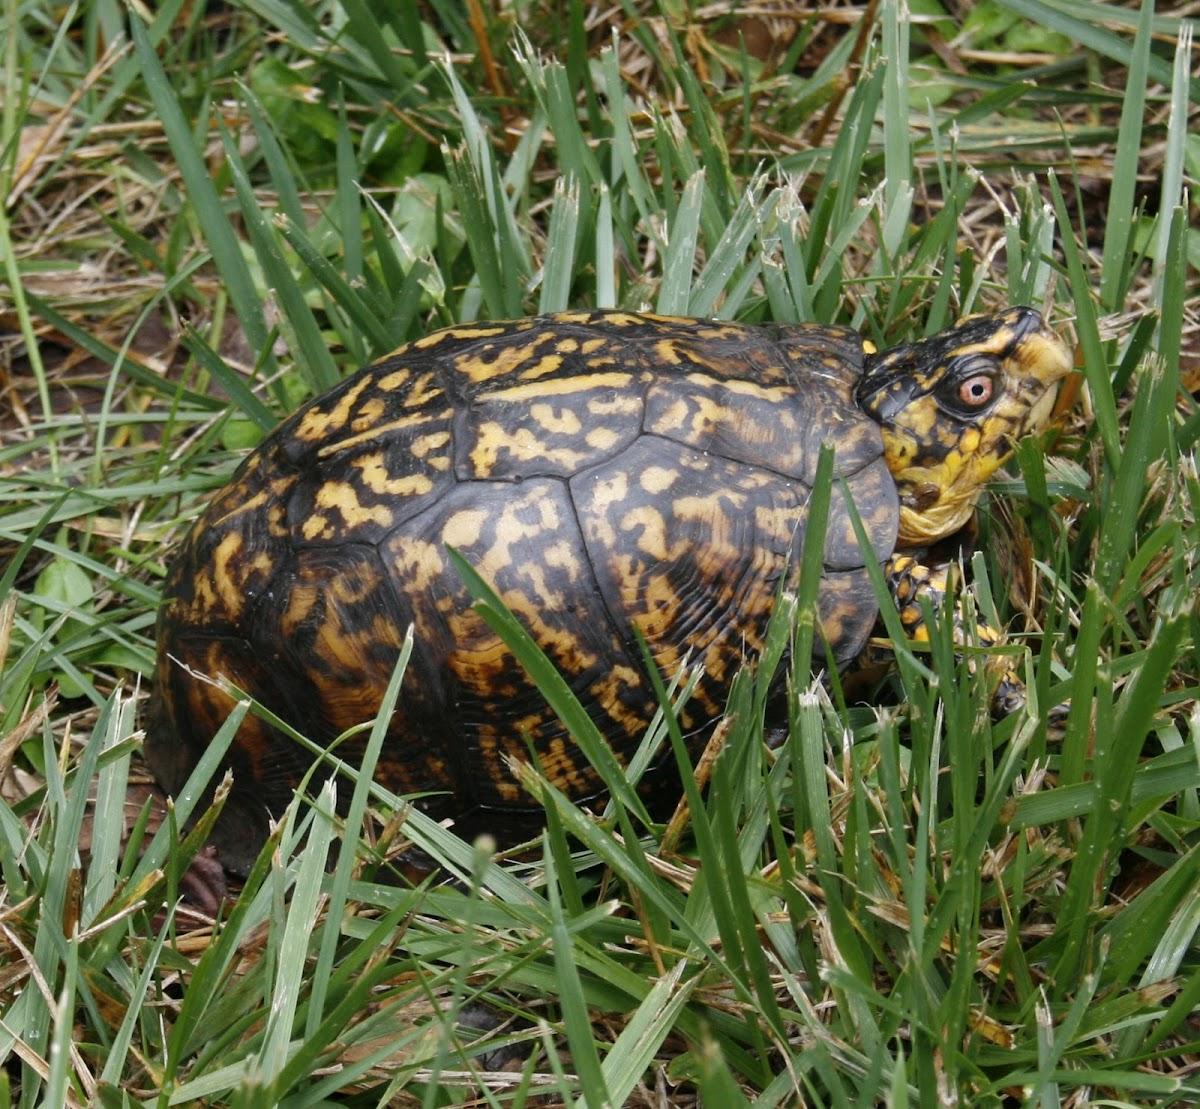 Eastern Box Turtle, male